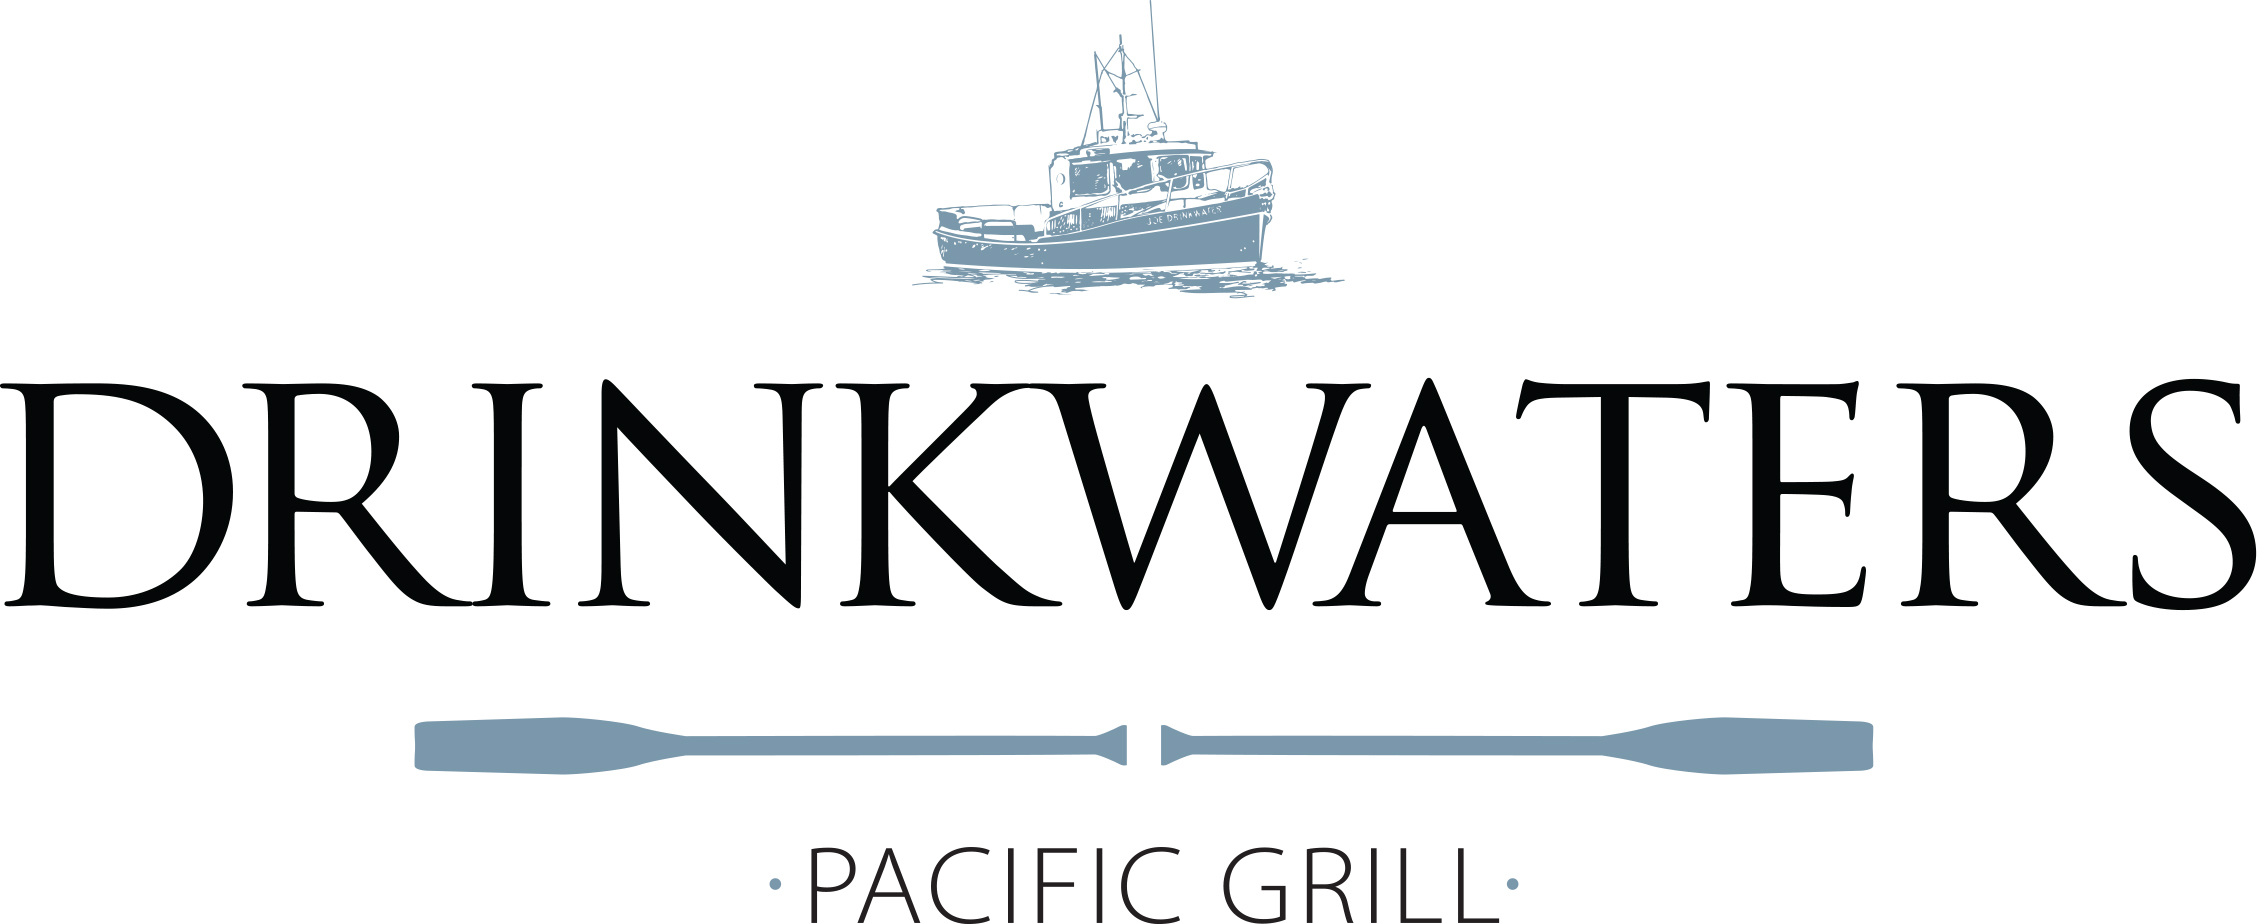 Drinkwater Logo.jpg